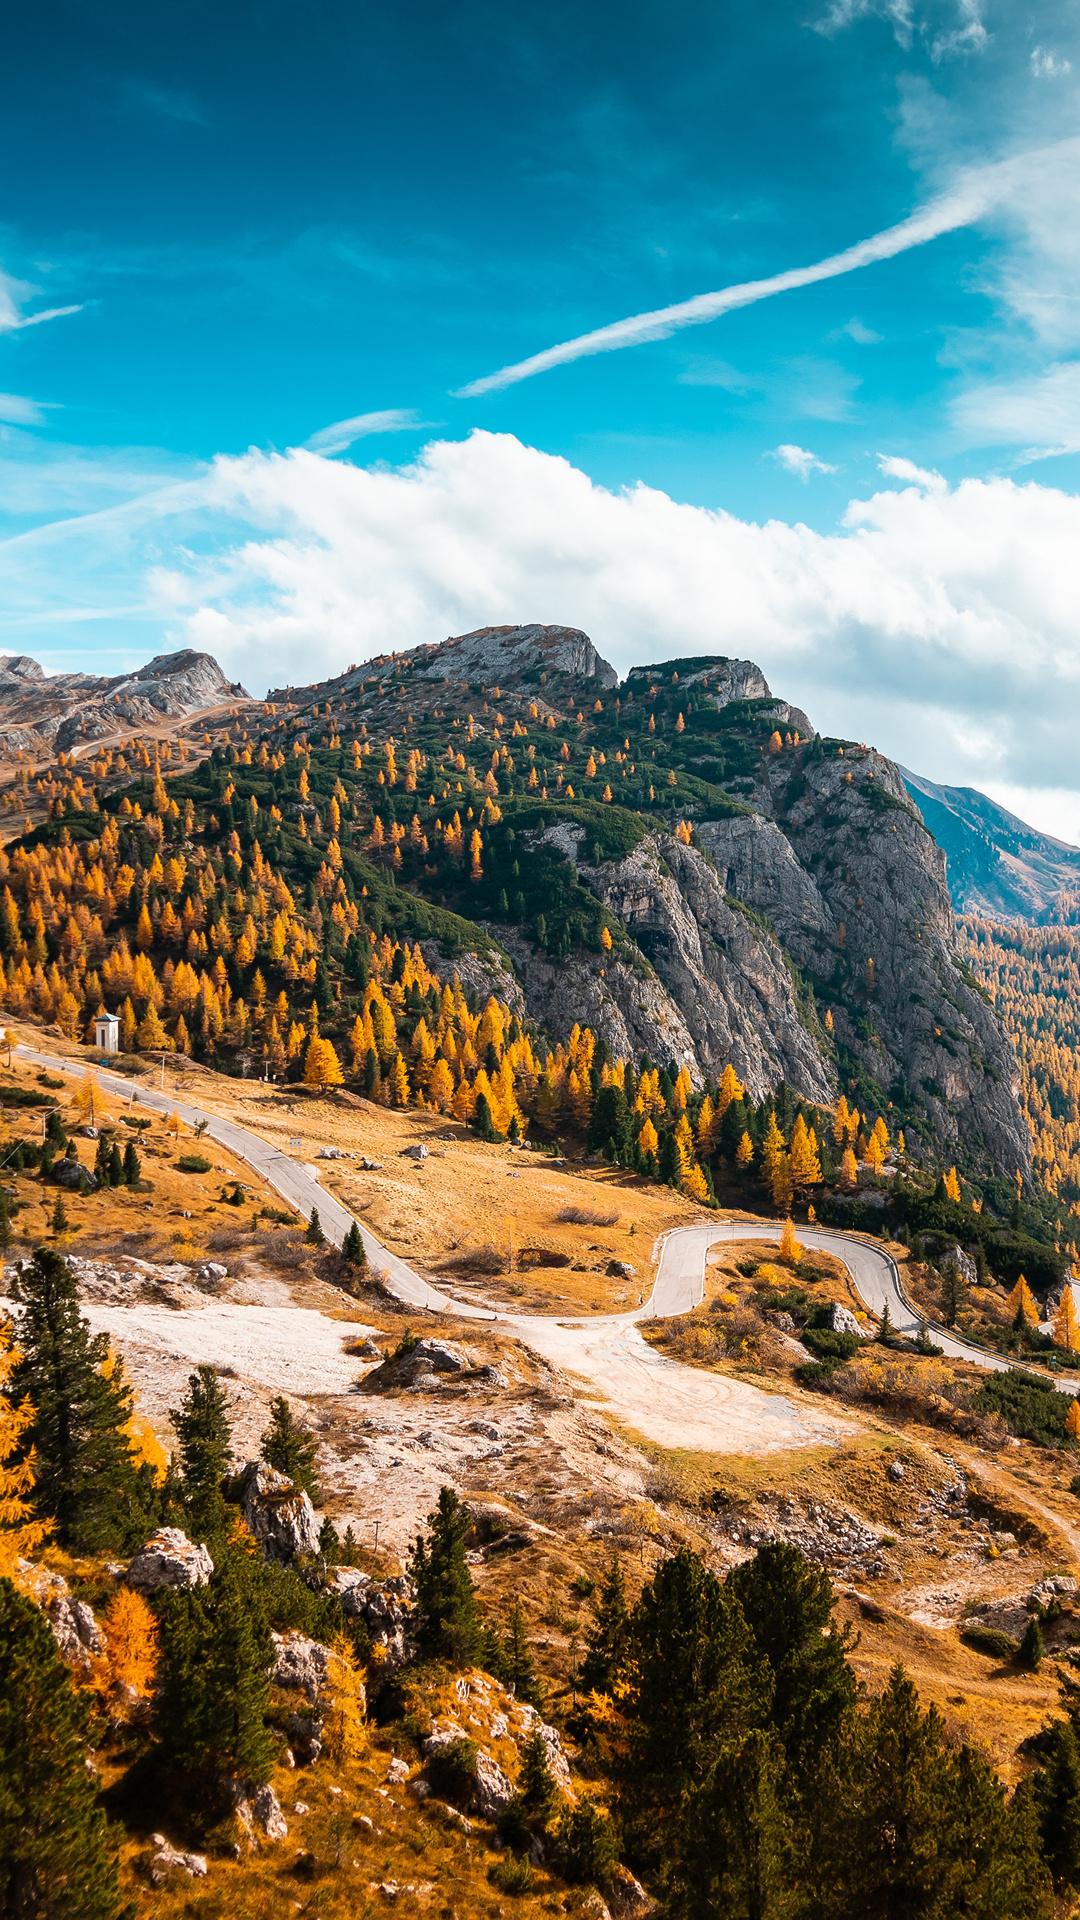 italy-autumn-forest-5k-1z.jpg